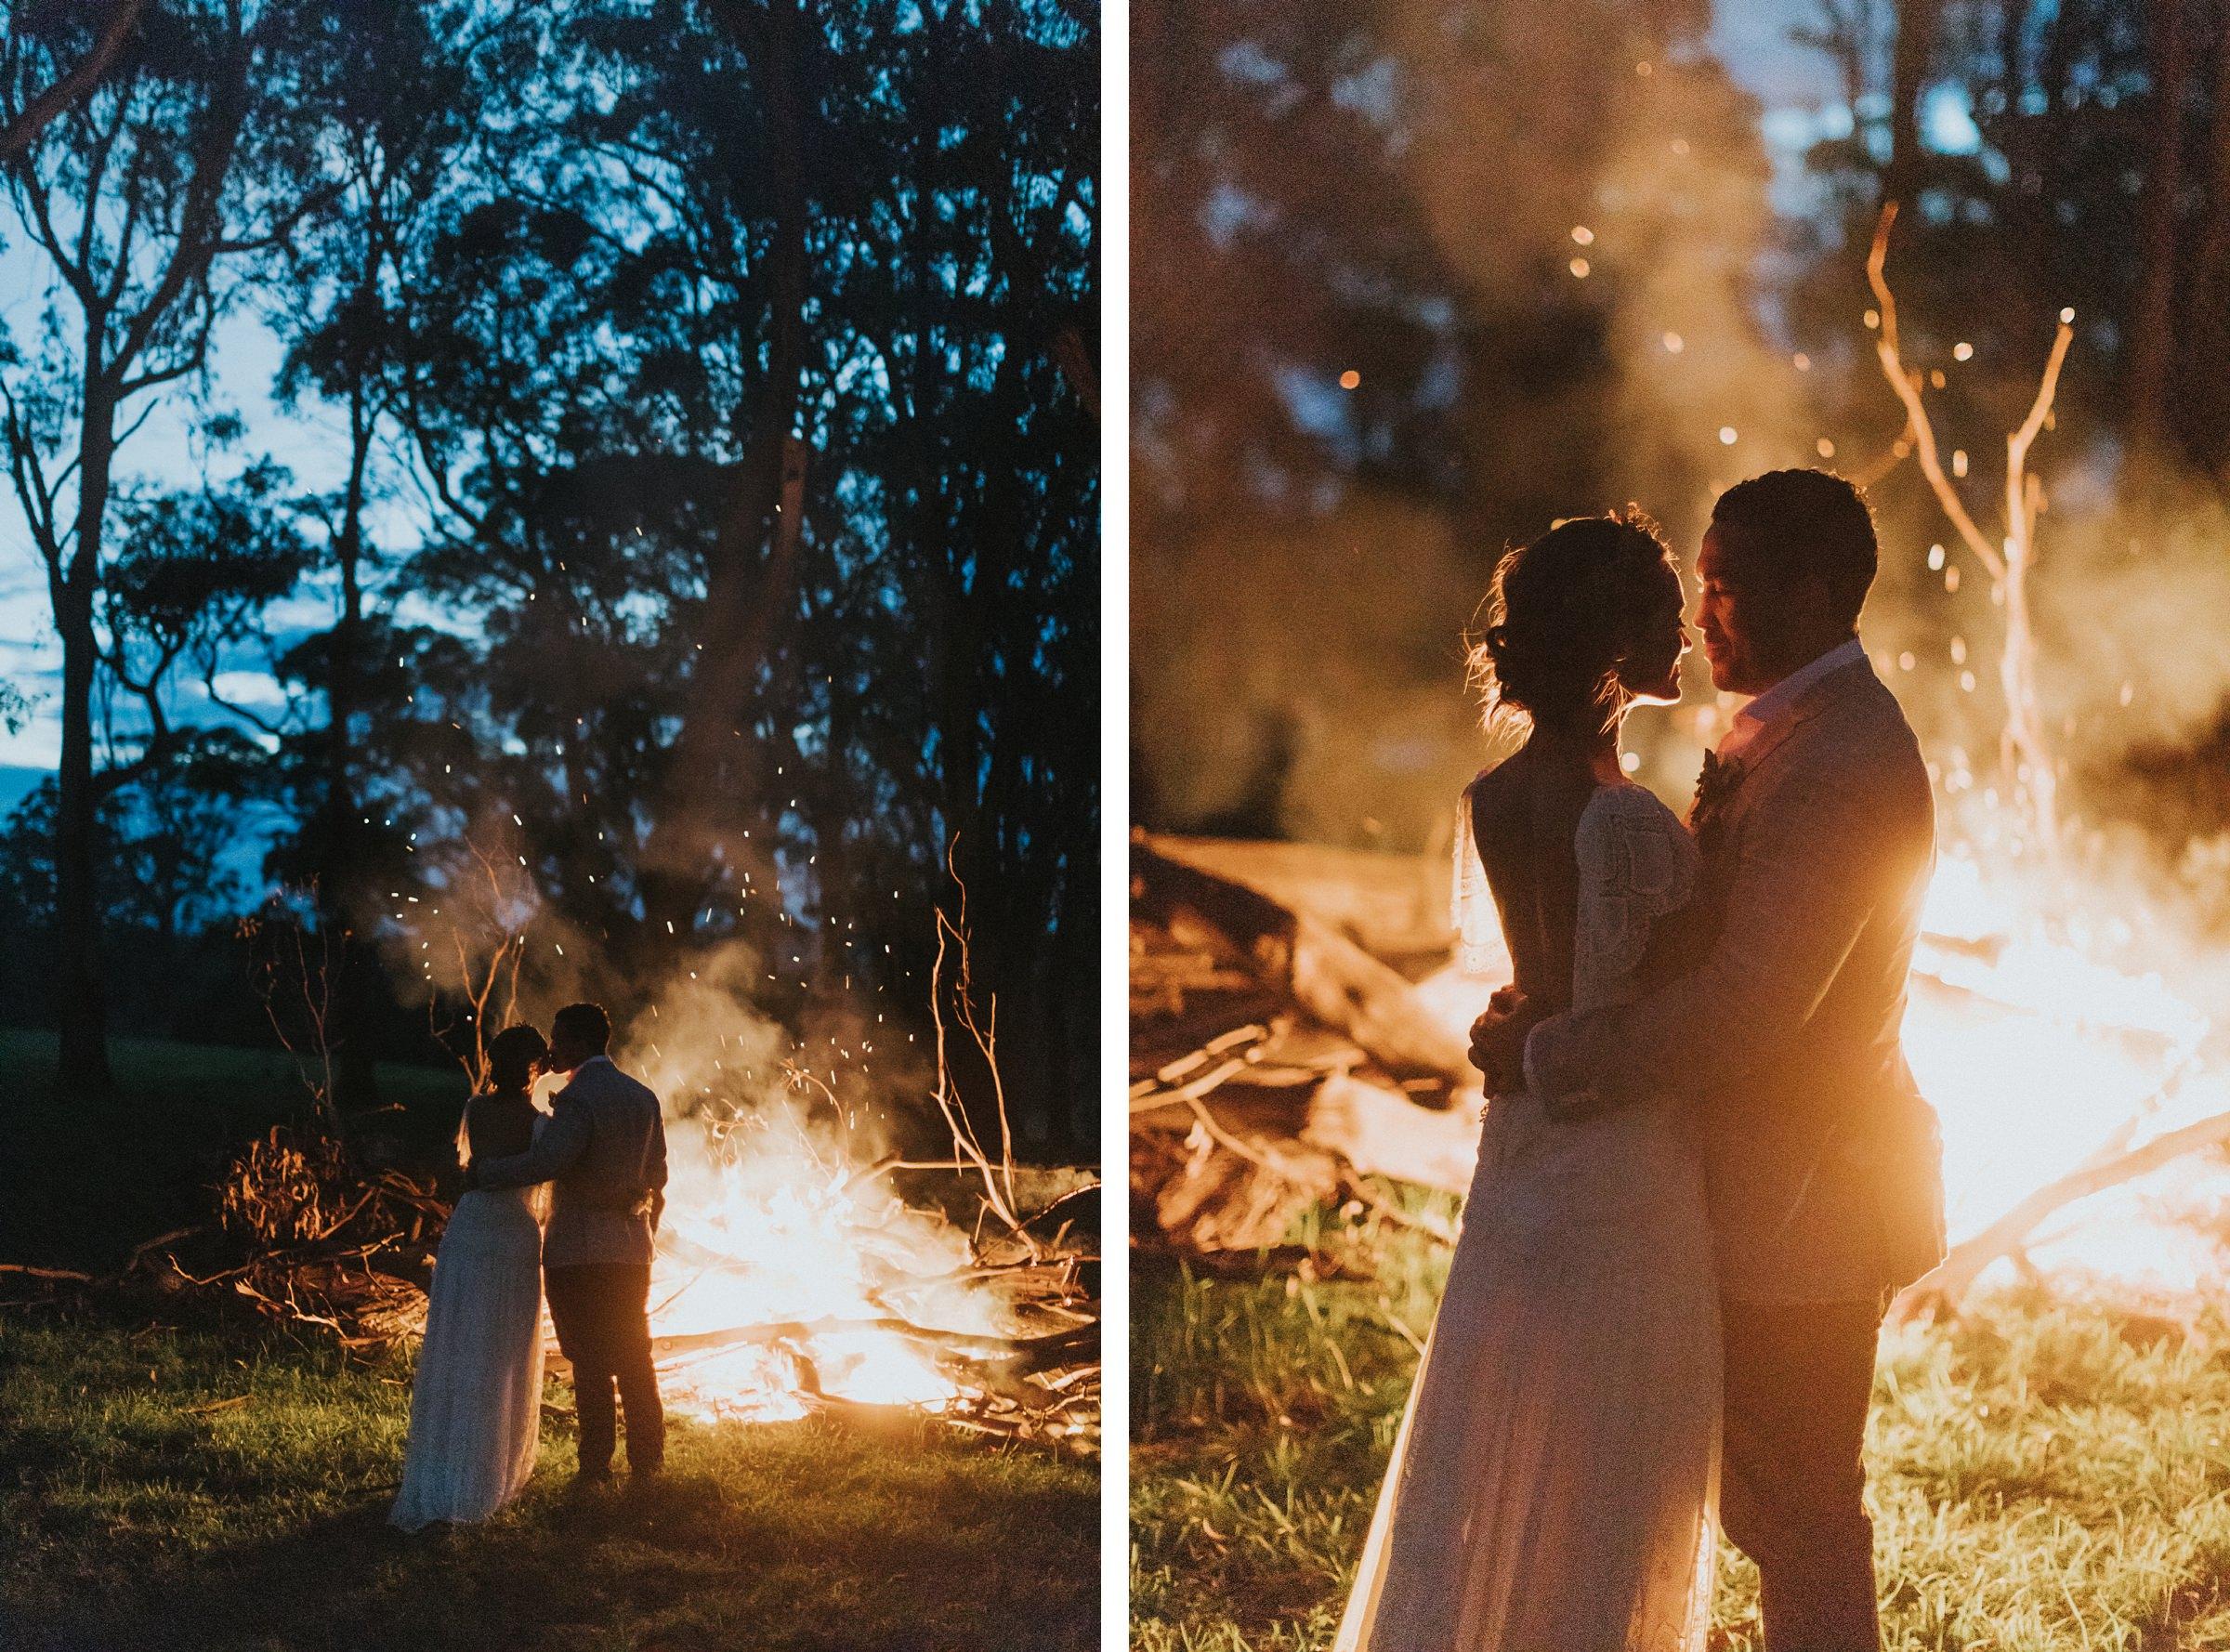 mali brae wedding photos in kangaroo valley